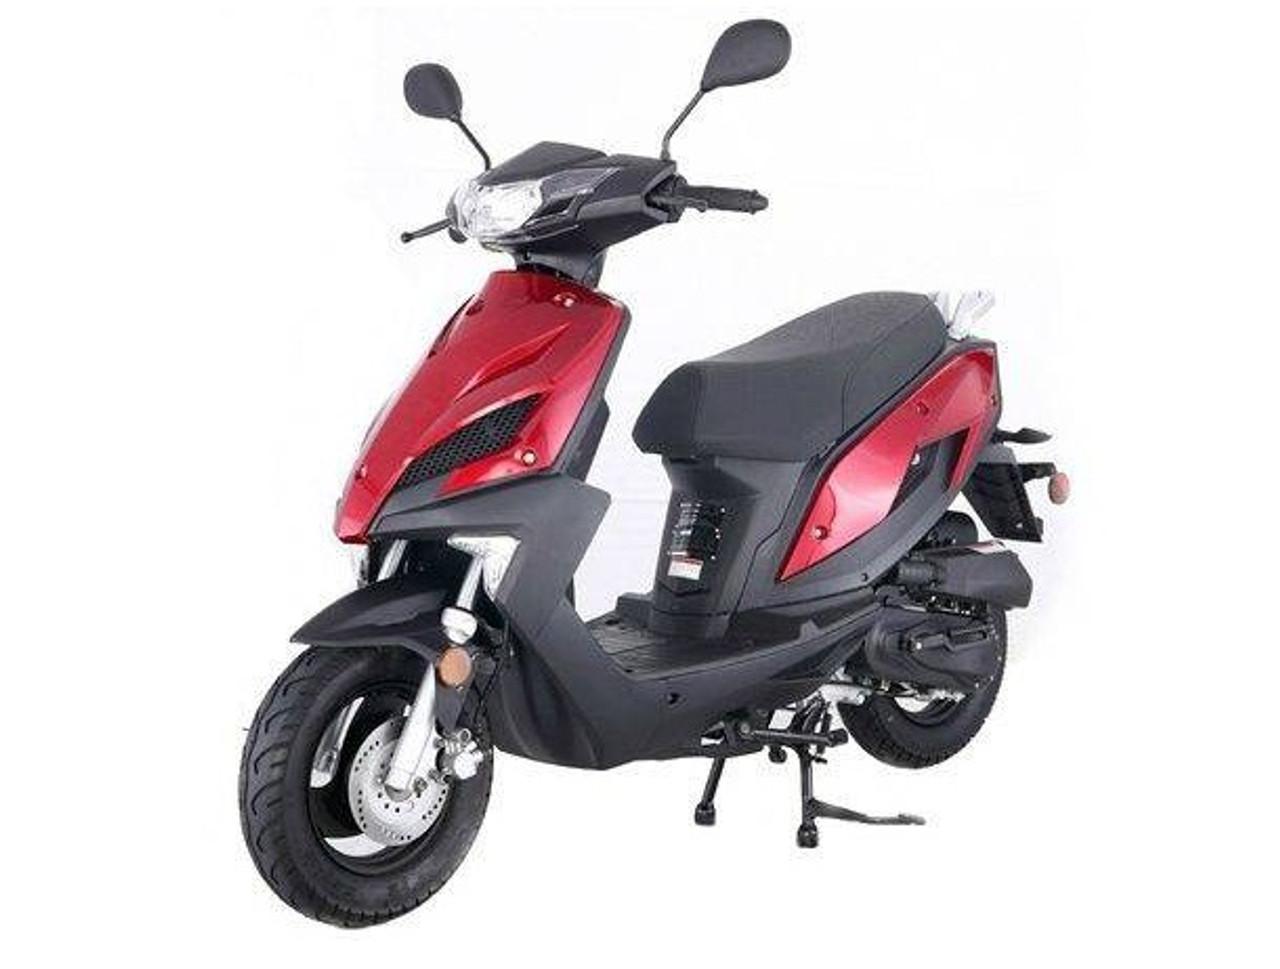 Taotao JET50 (NewSpeed50) Replaceable Plastic Body Gas Street Legal Scooter